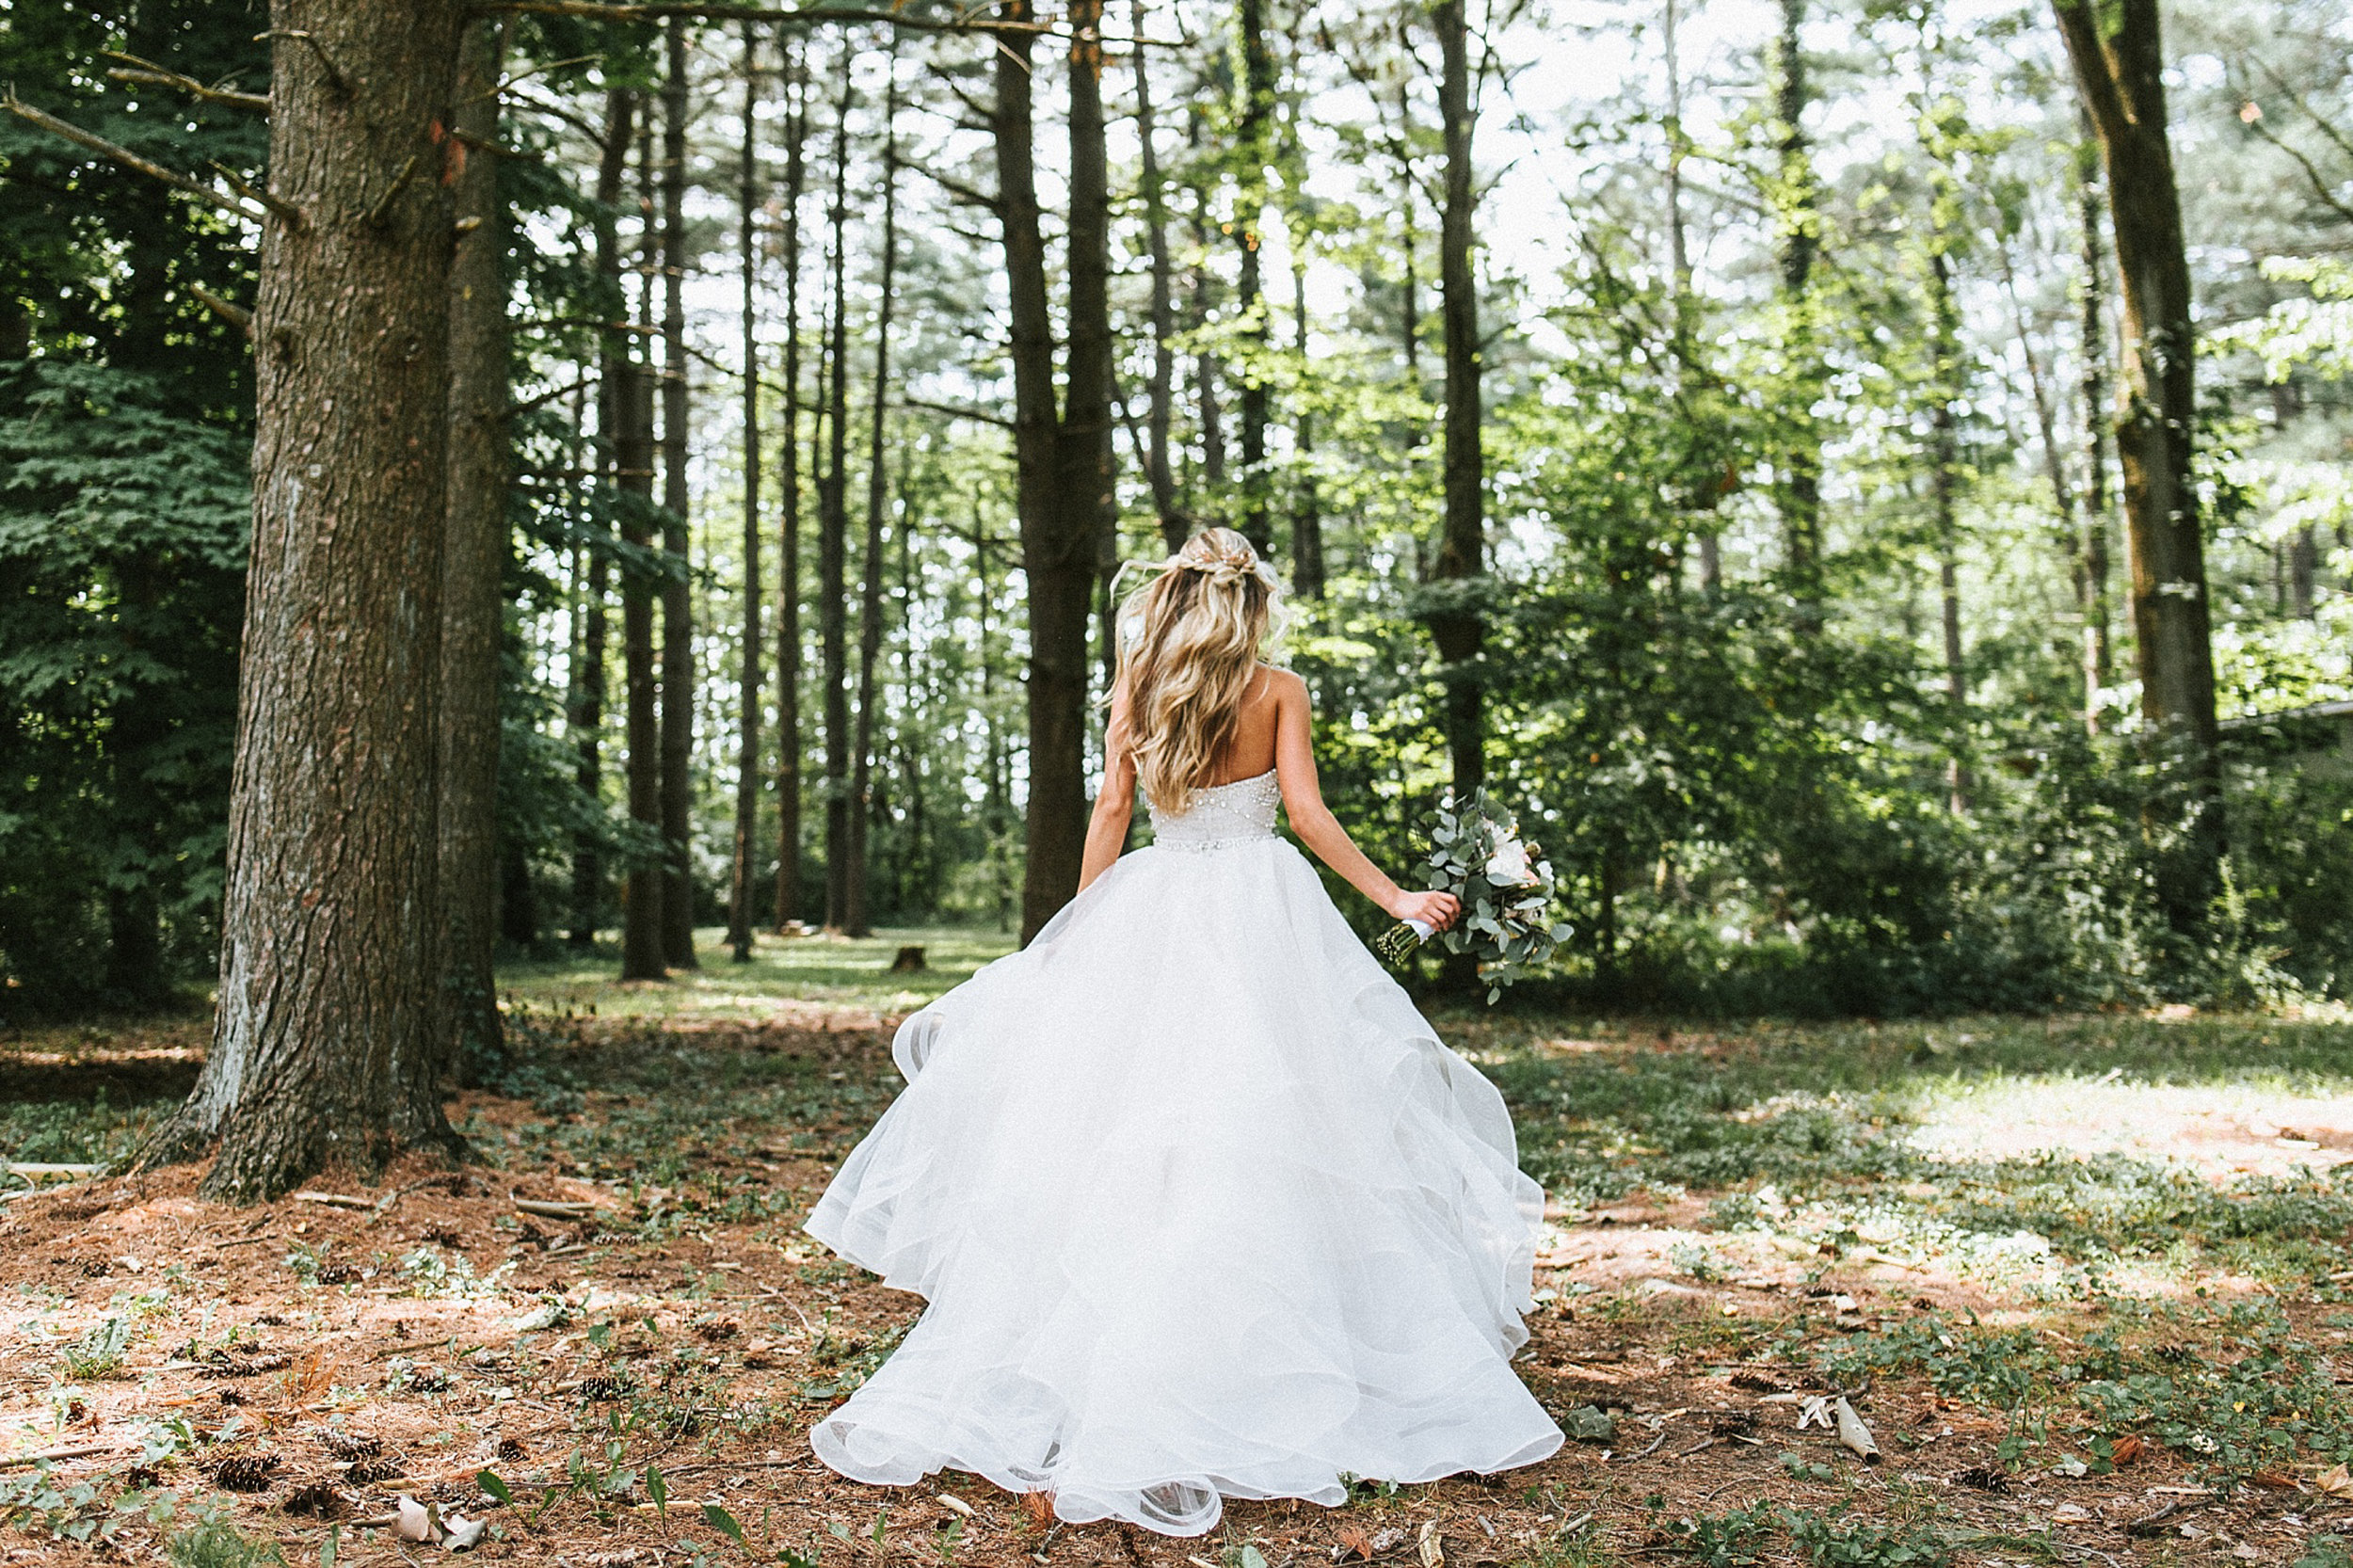 Brooke Townsend Photography - Cincinnati Wedding Photographer (25 of 153).jpg